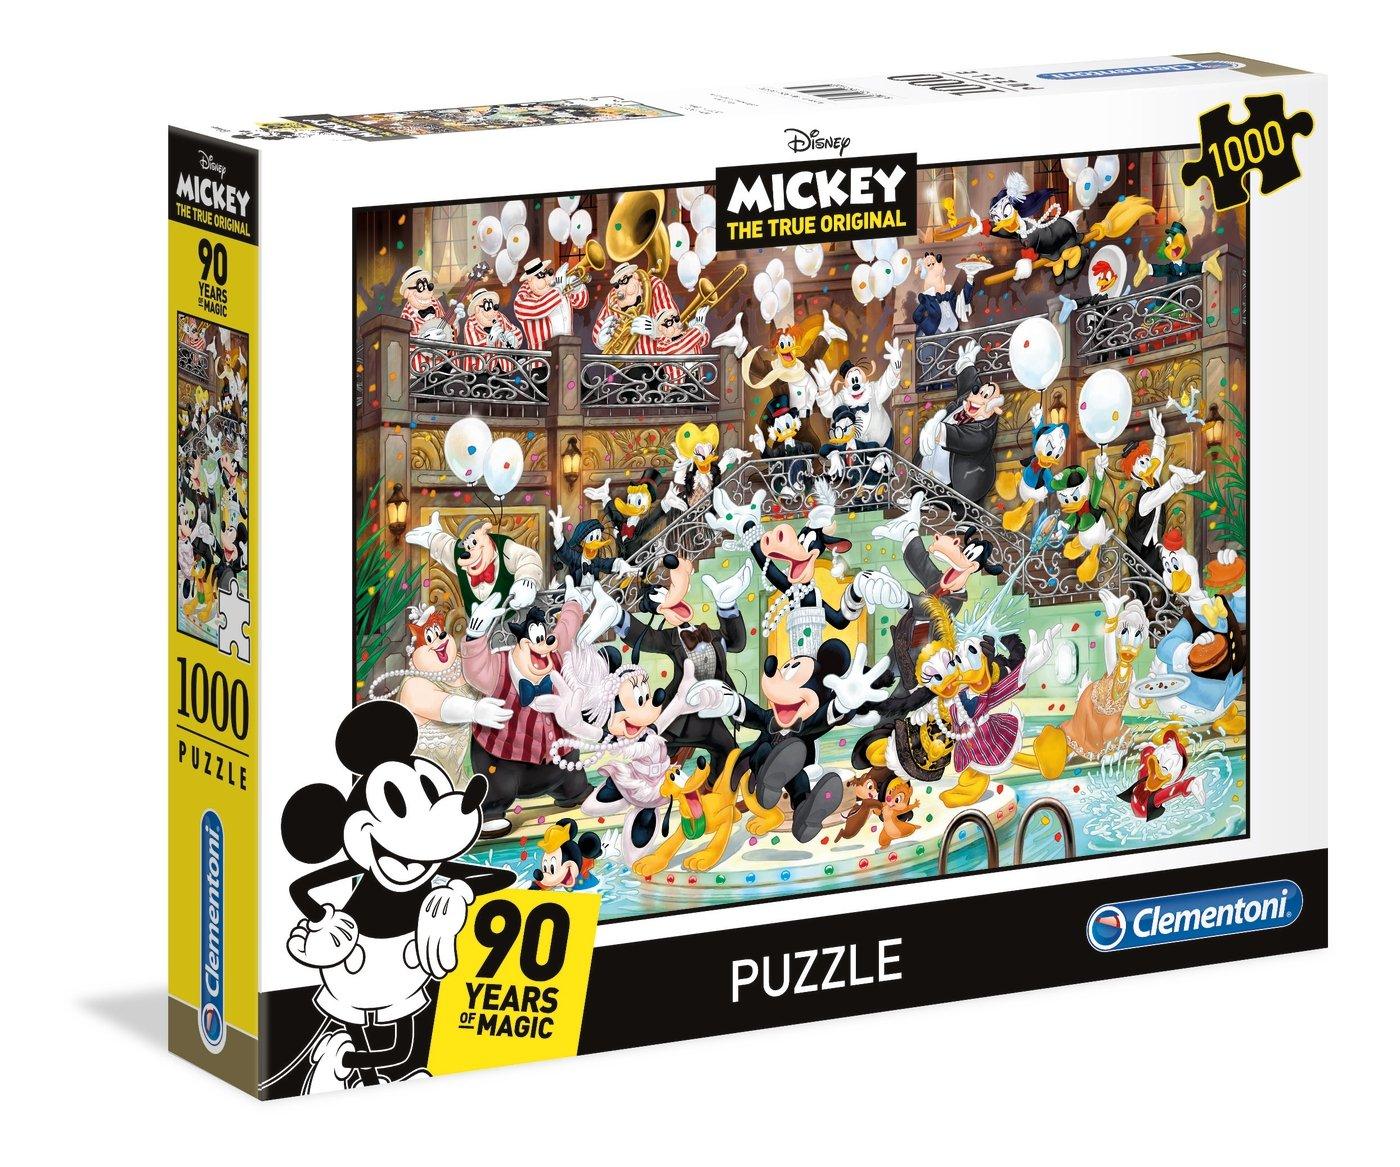 DISNEY - MICKEY 90TH CELEBRATION - PUZZLE 1000P